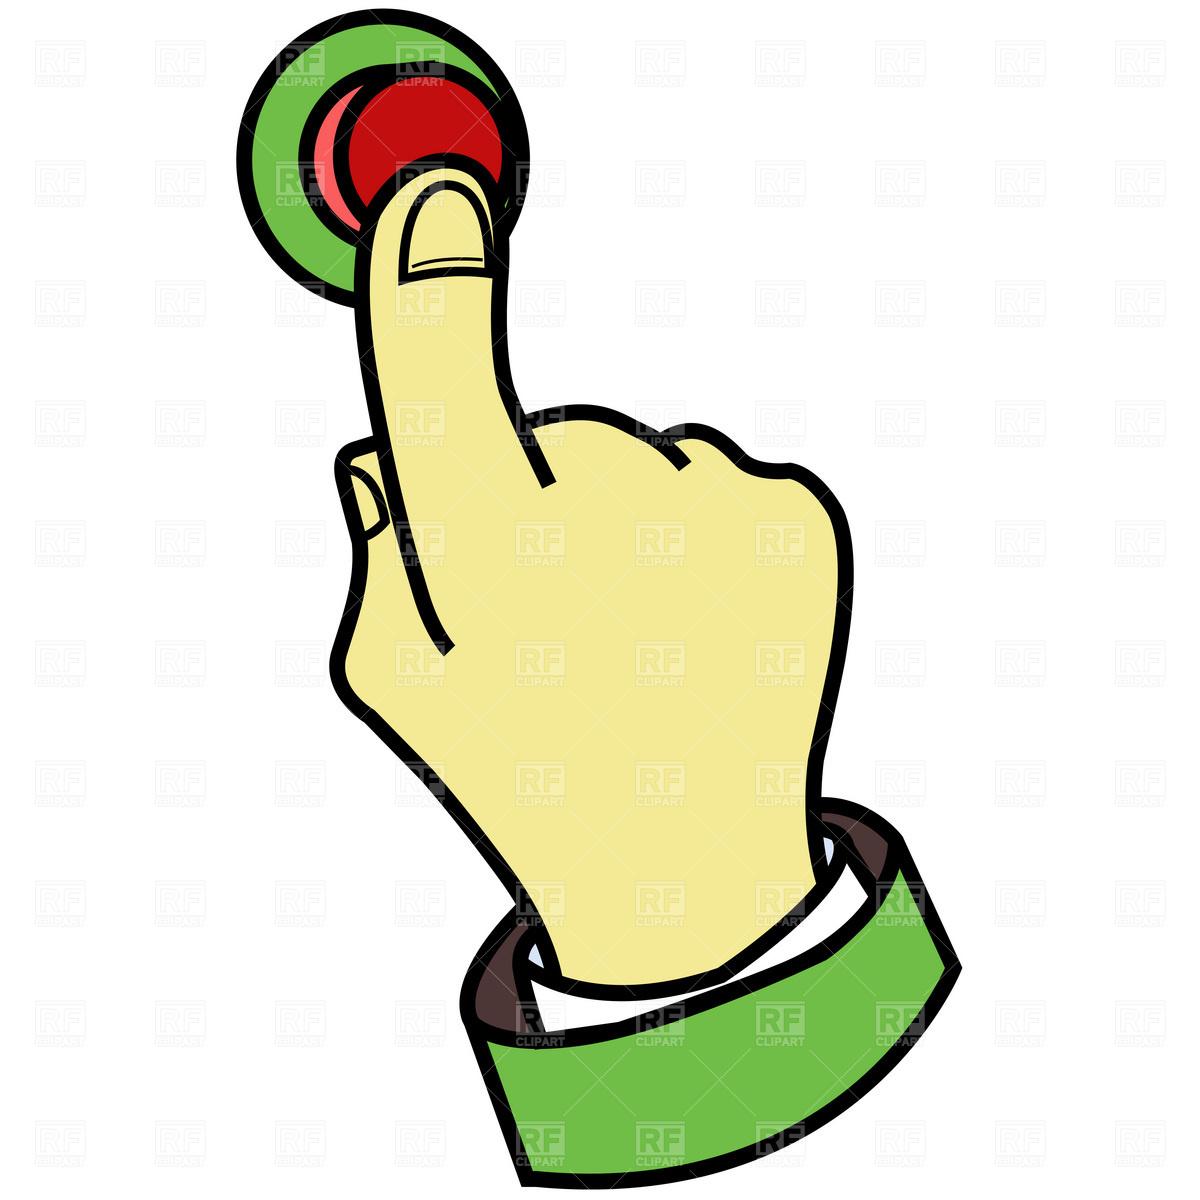 Button clipart press button Vector Image button Finger pressing